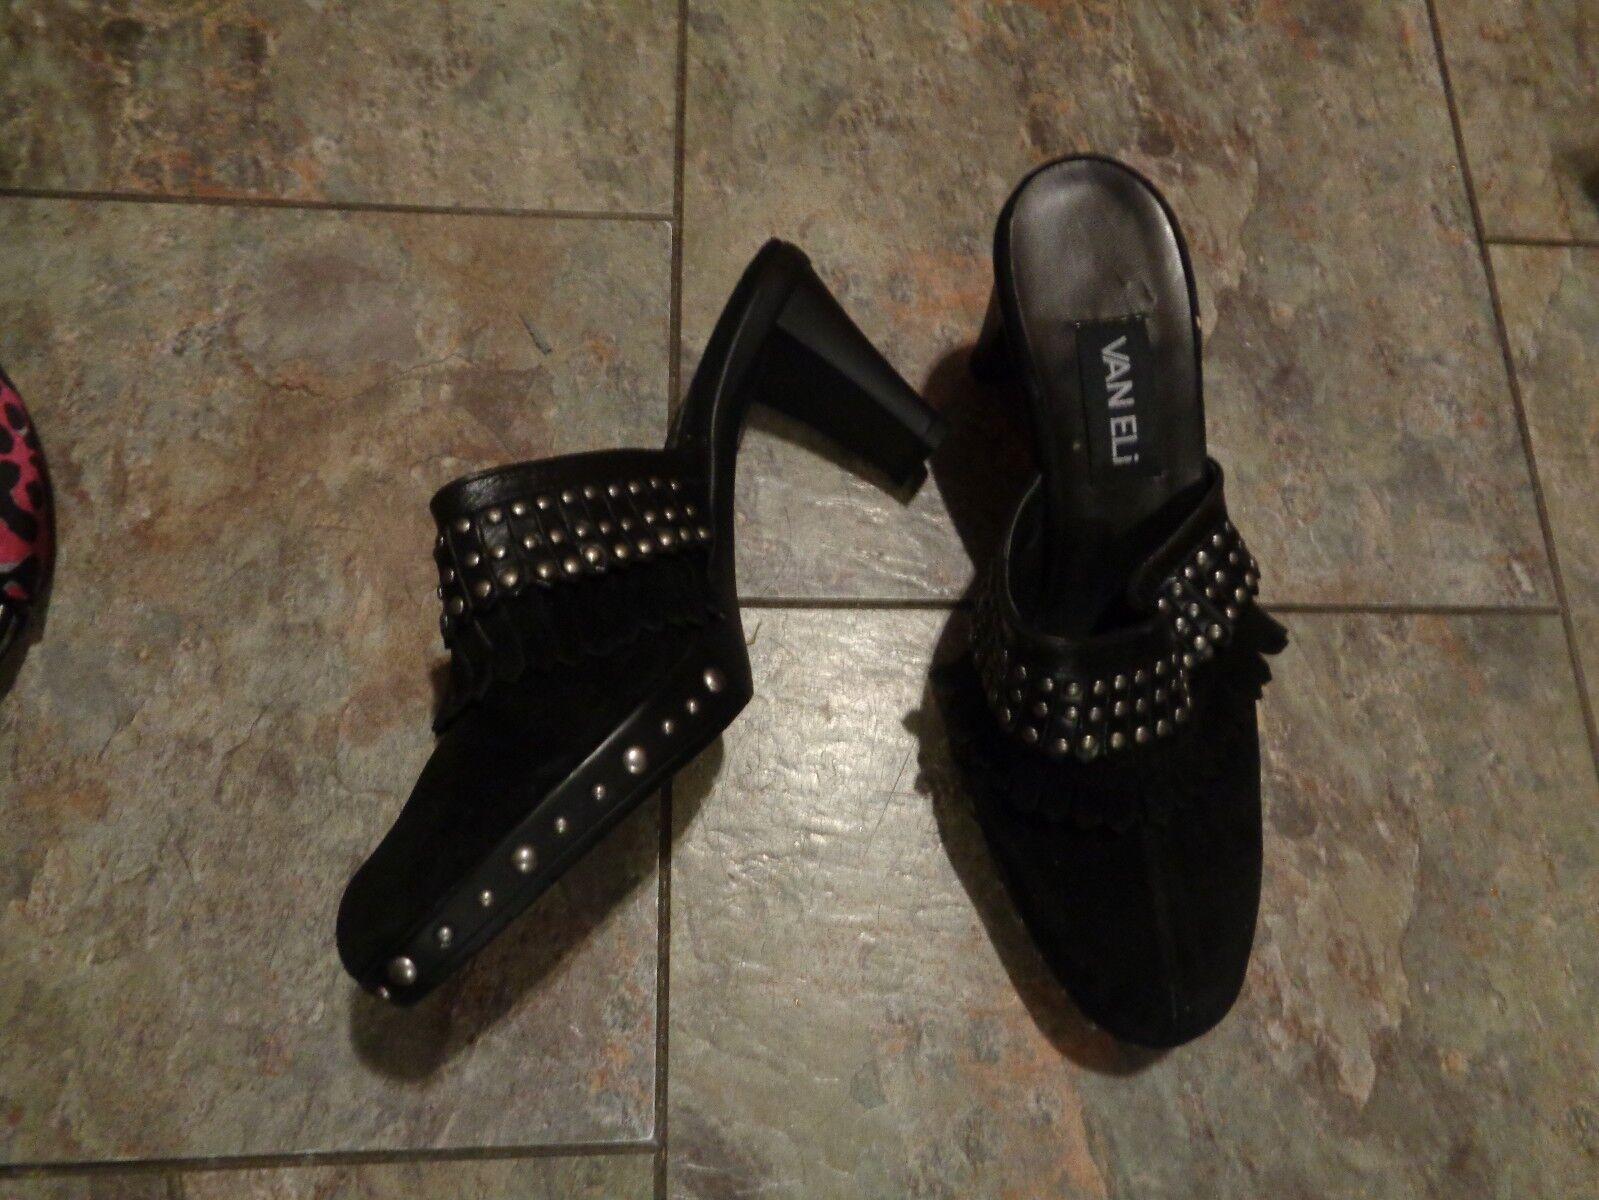 Vaneli schwarz suede leather leather leather tassel heels schuhe Größe 8 1 2 a29335